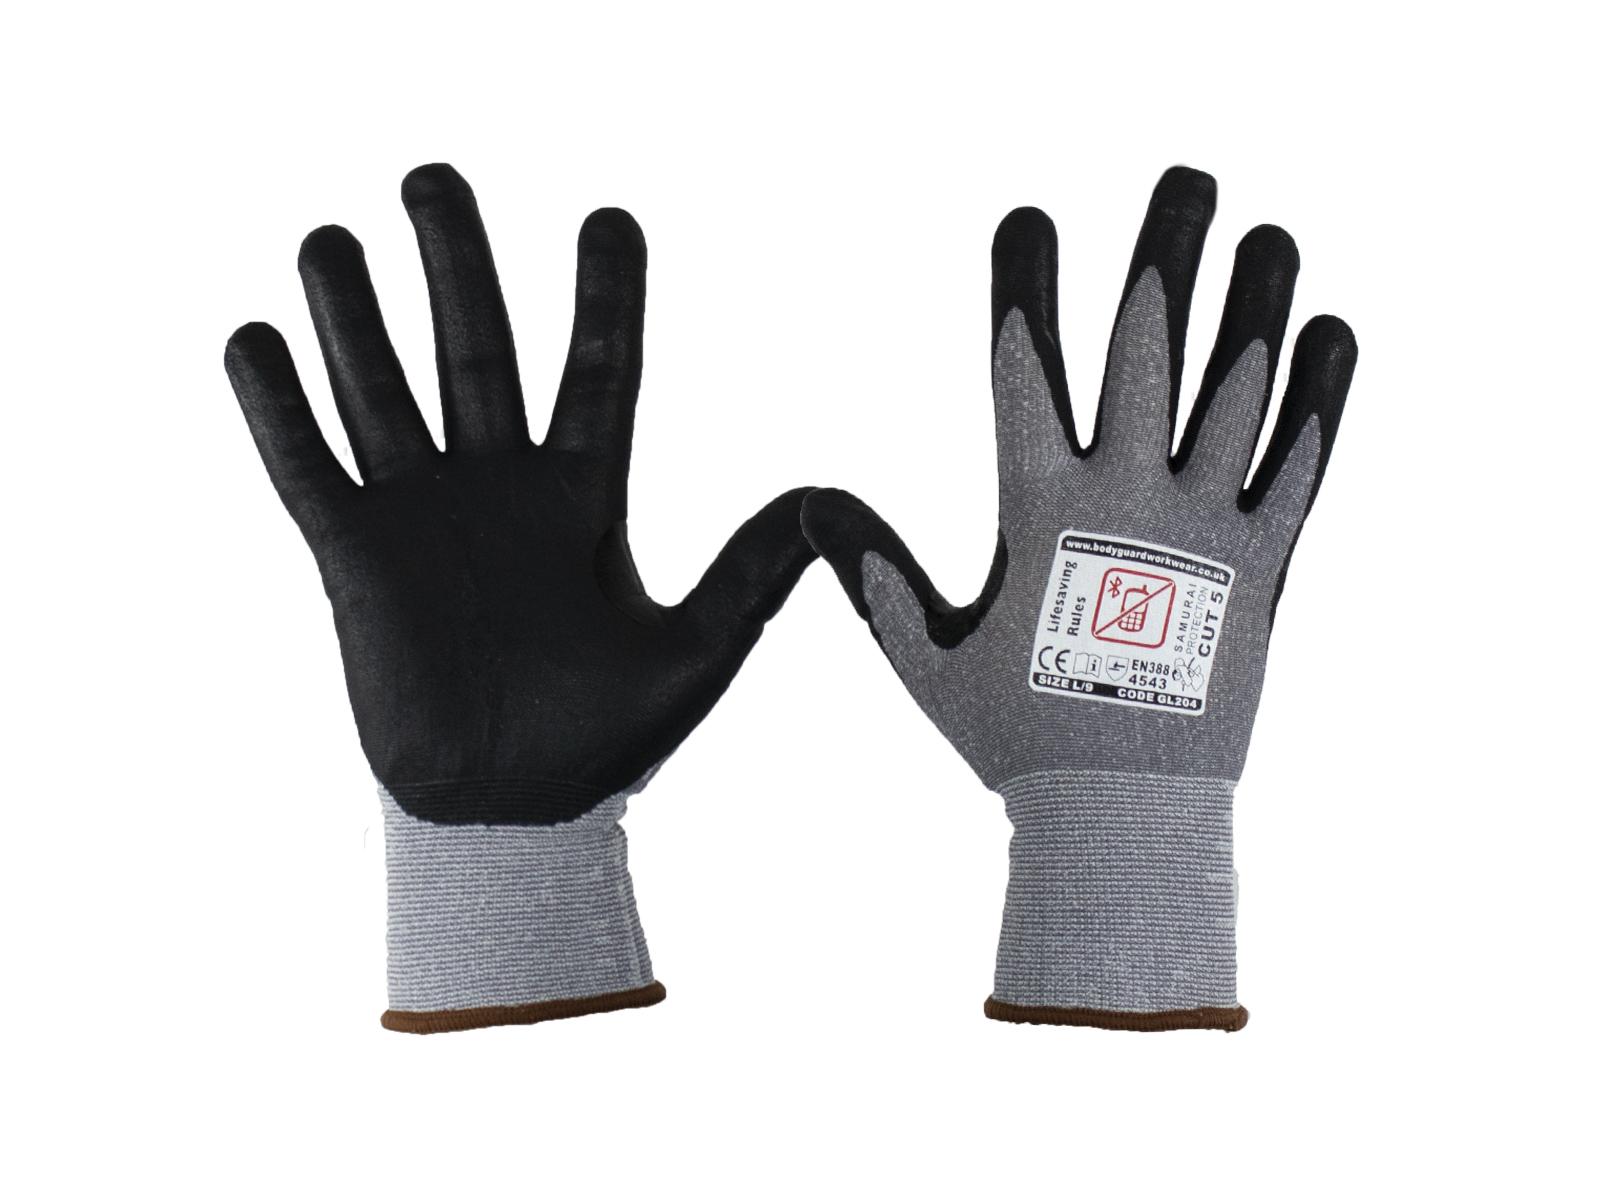 Samurai Super lite Cut 5 Safety Gloves w/ Touch Screen Technology - Multipack